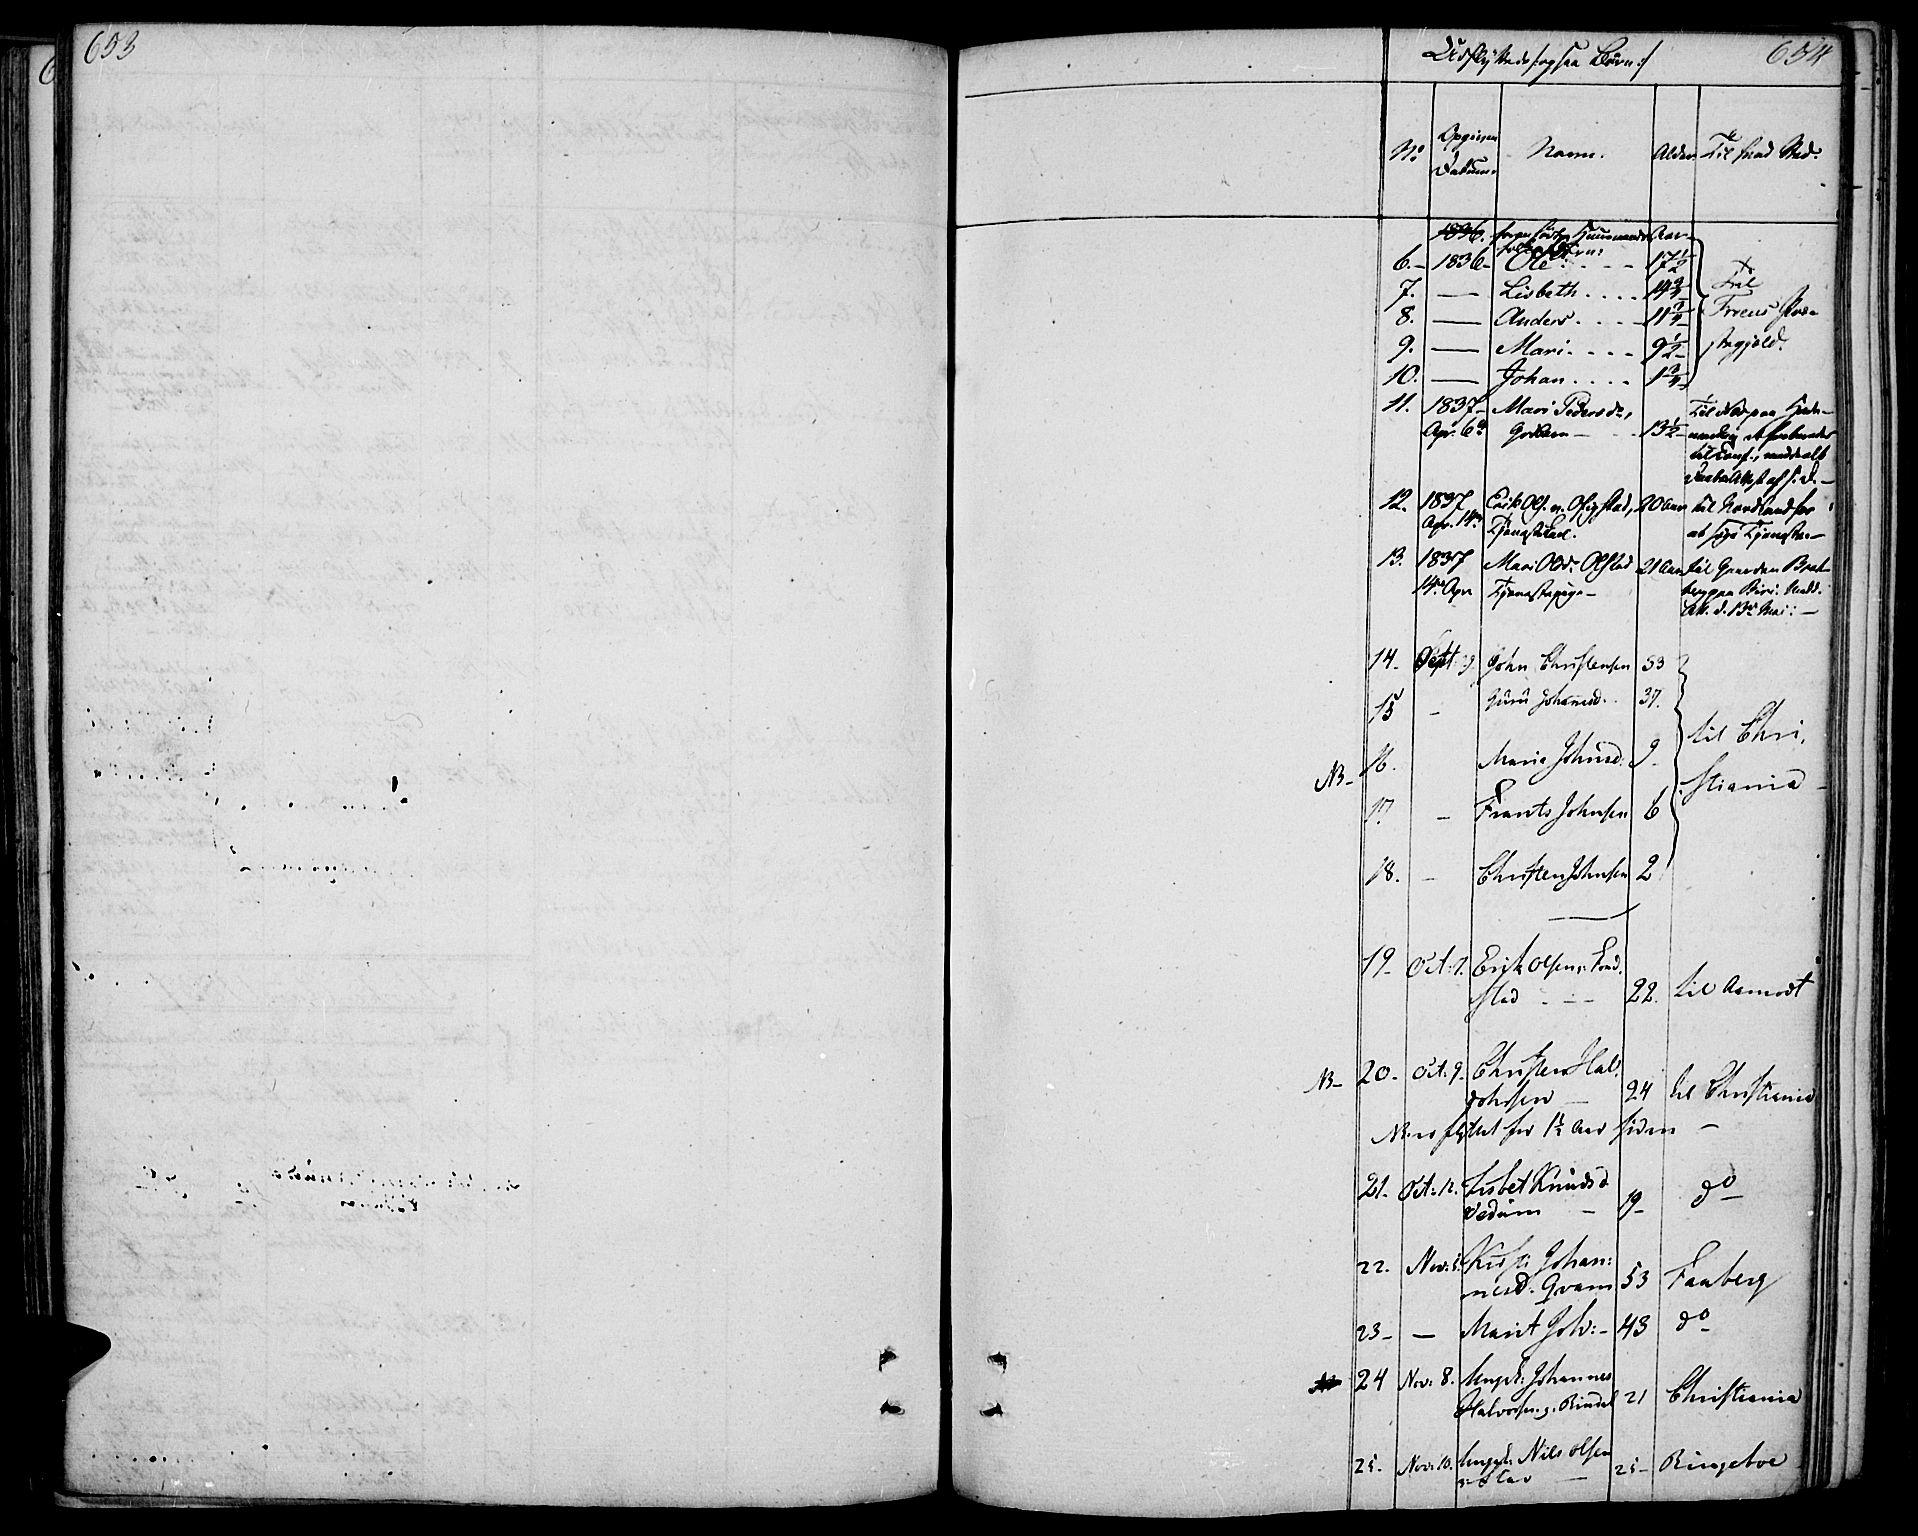 SAH, Øyer prestekontor, Ministerialbok nr. 4, 1824-1841, s. 653-654